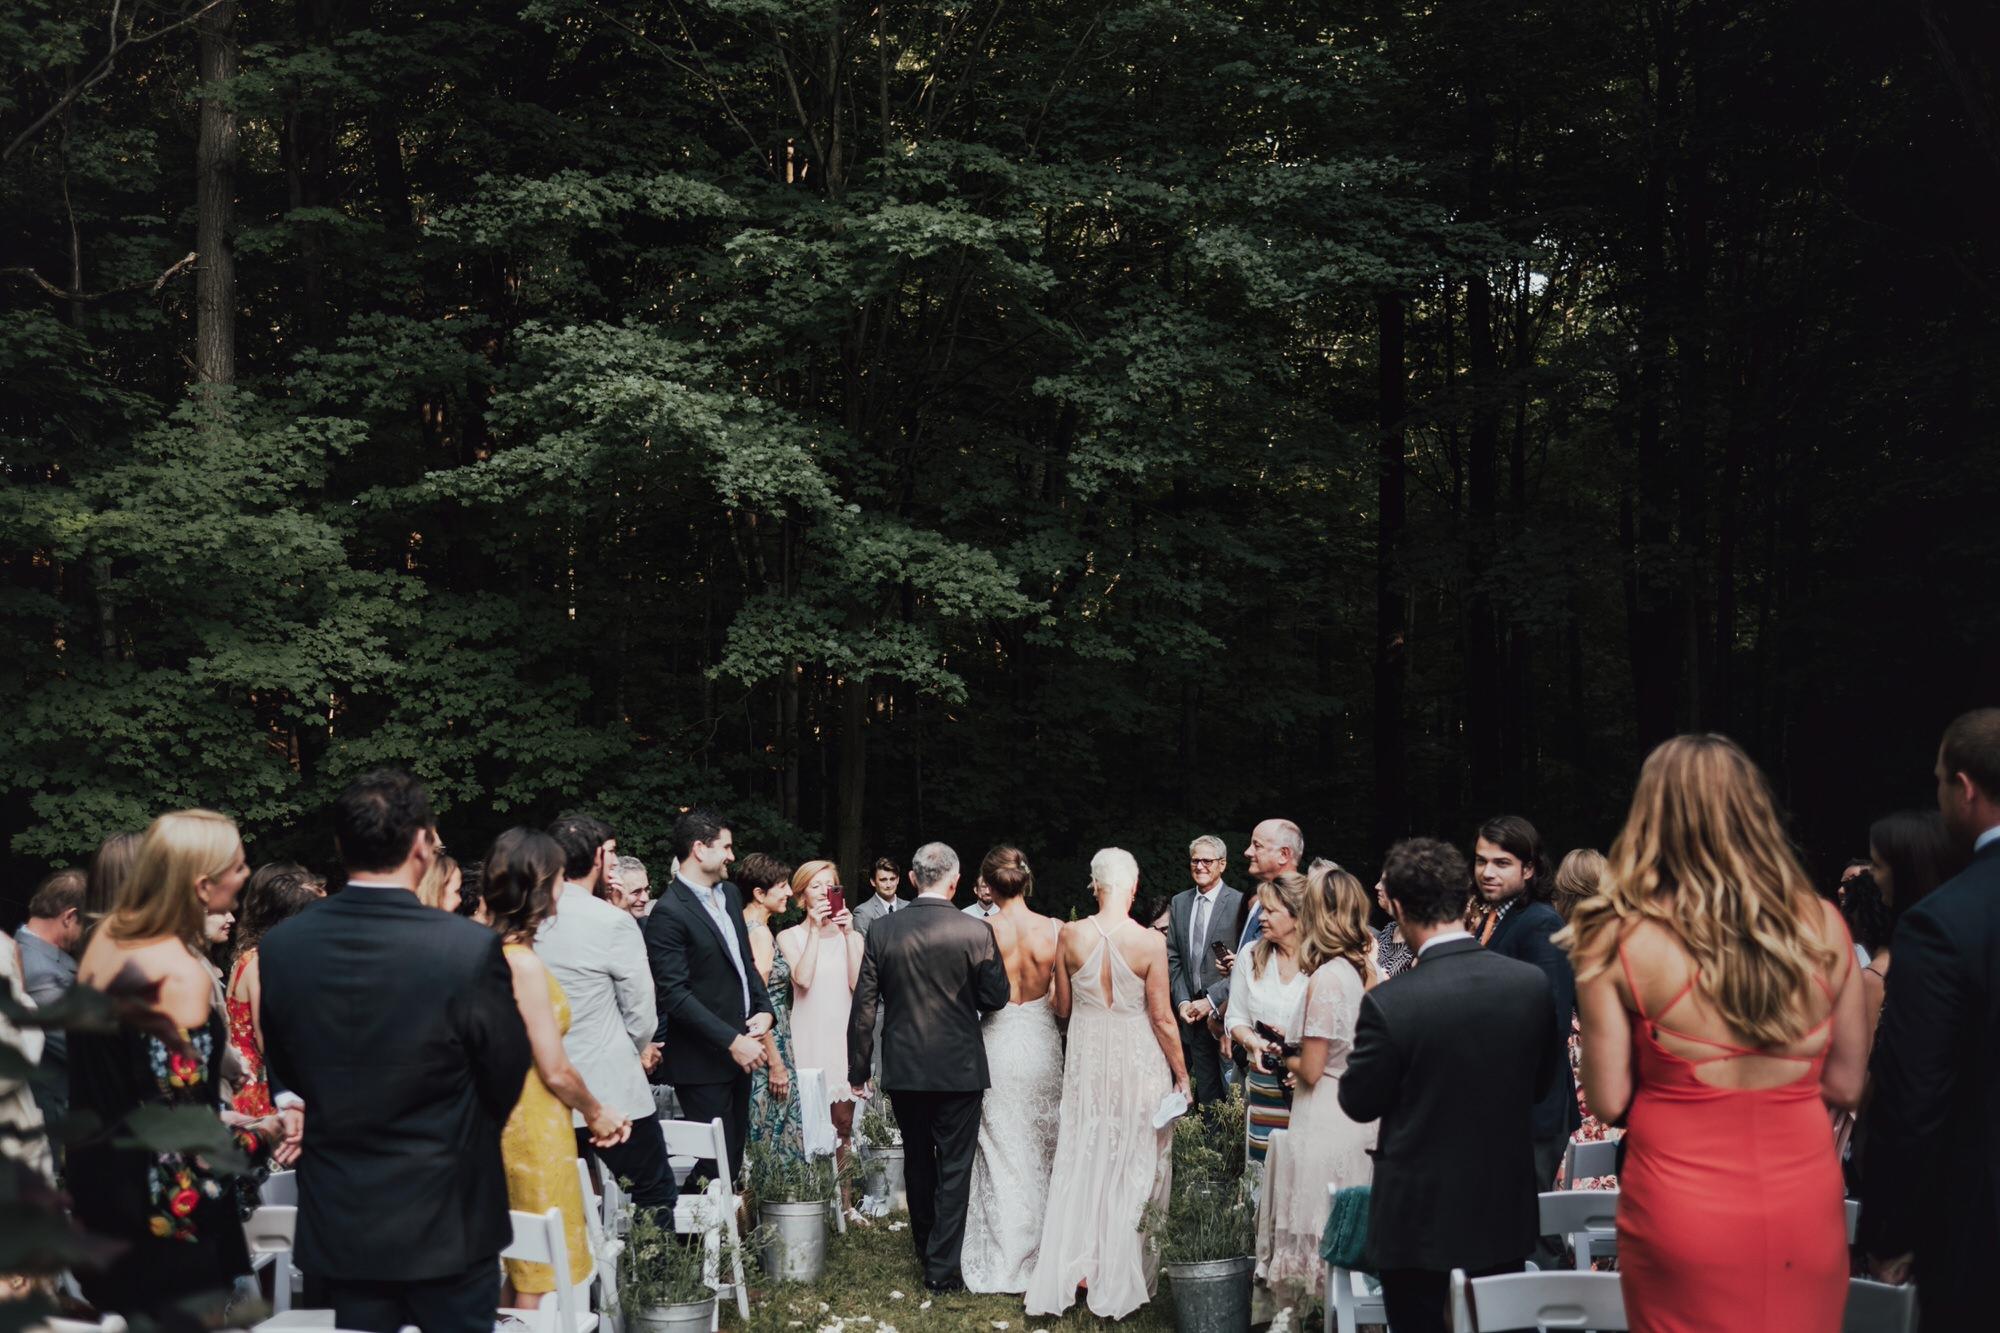 emily-aaron-rochester-new-york-wedding-photographer-148.JPG